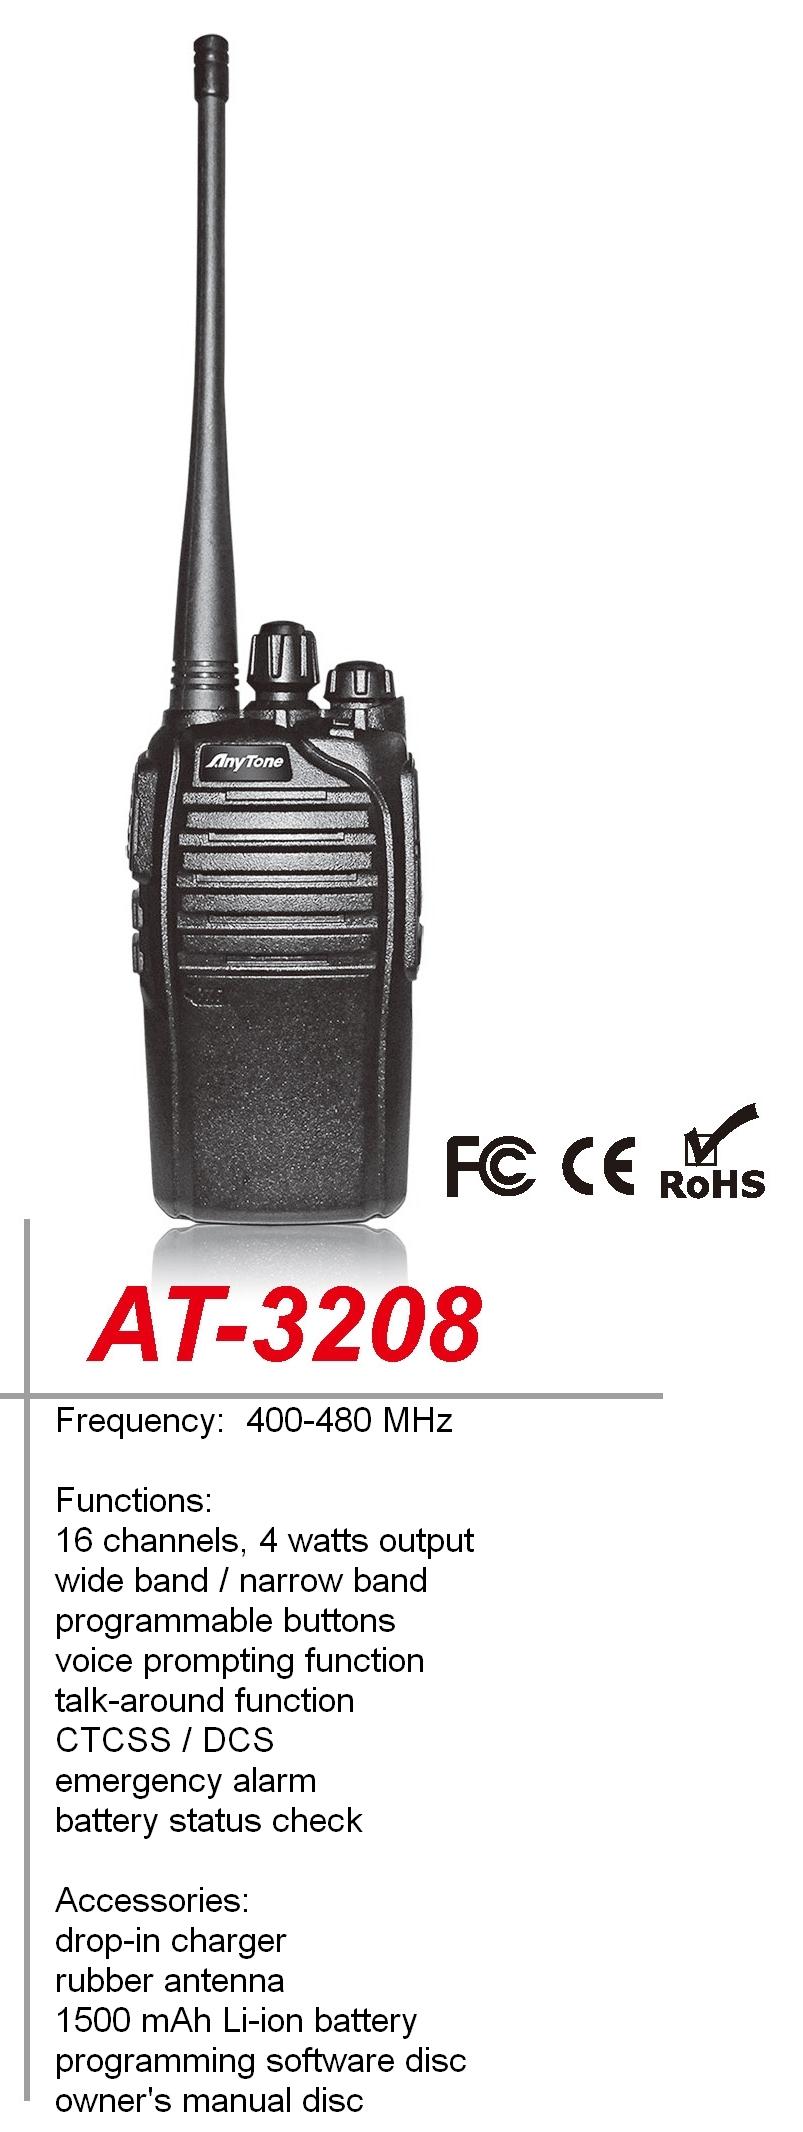 Anytone AT-3208U 16 Channels UHF